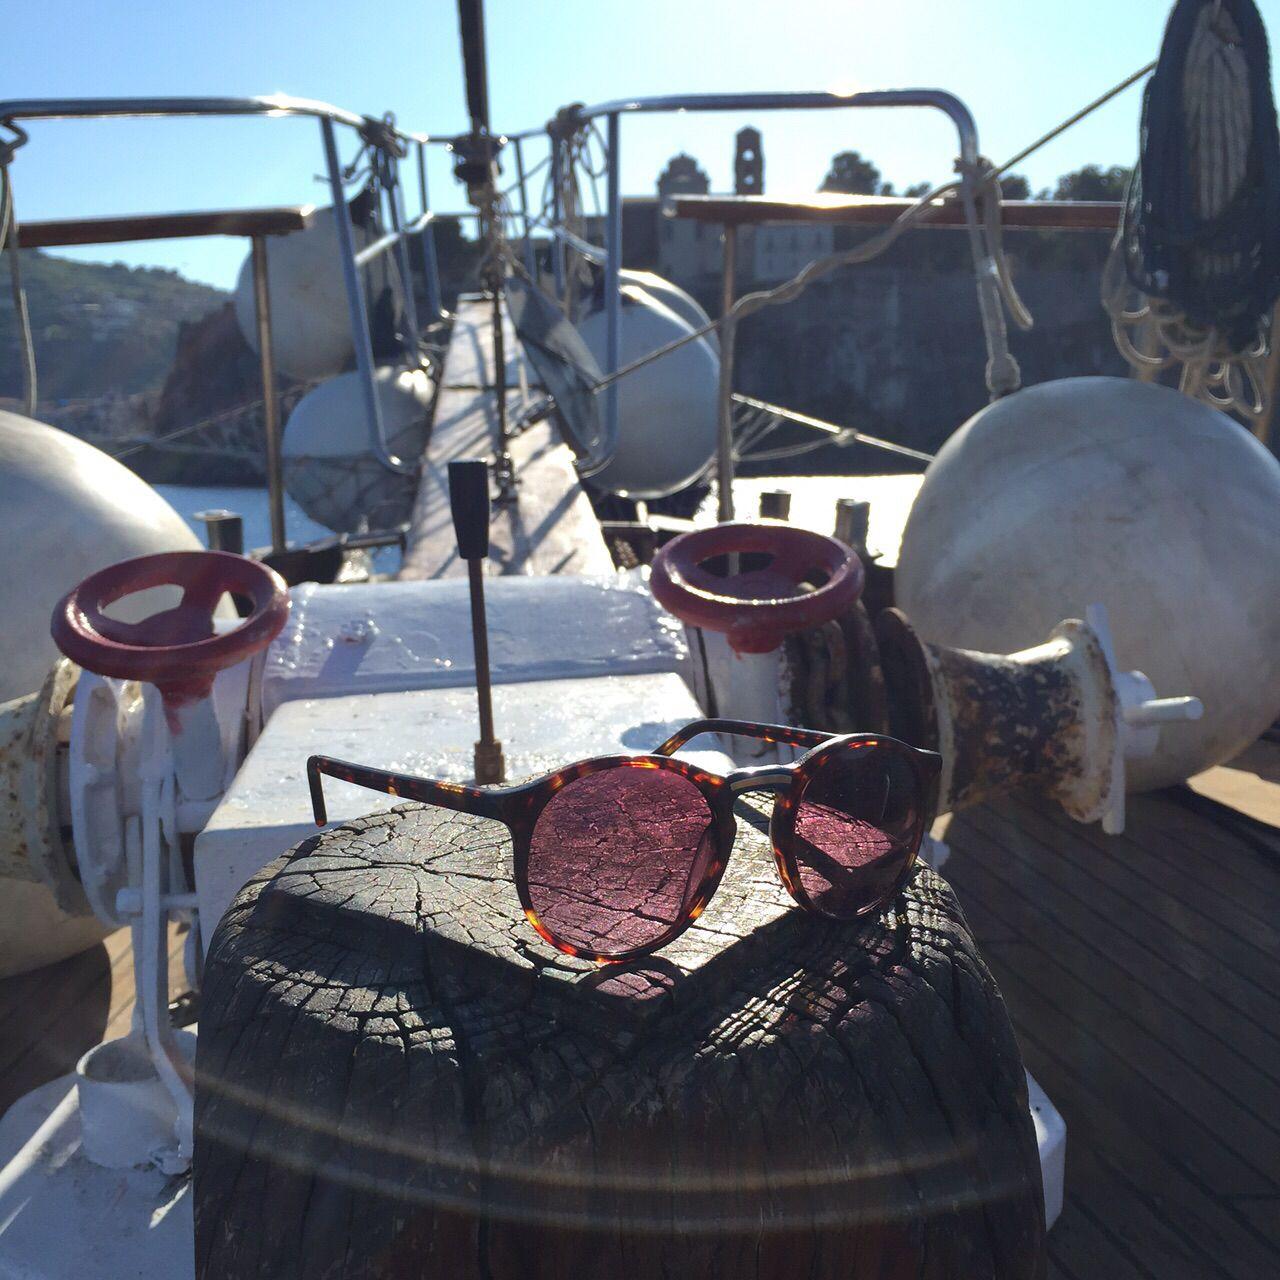 Sun, sailing and shades #sunglasses #sun #shades #sailing #boat #sail #customise #customize #customisation #customization #personalise #personalize #personalisation #personalization #style #unique #fashion #fblogger #fashionblogger #love #blue #blog #sea #holiday #island #paradise http://www.stapleandford.com